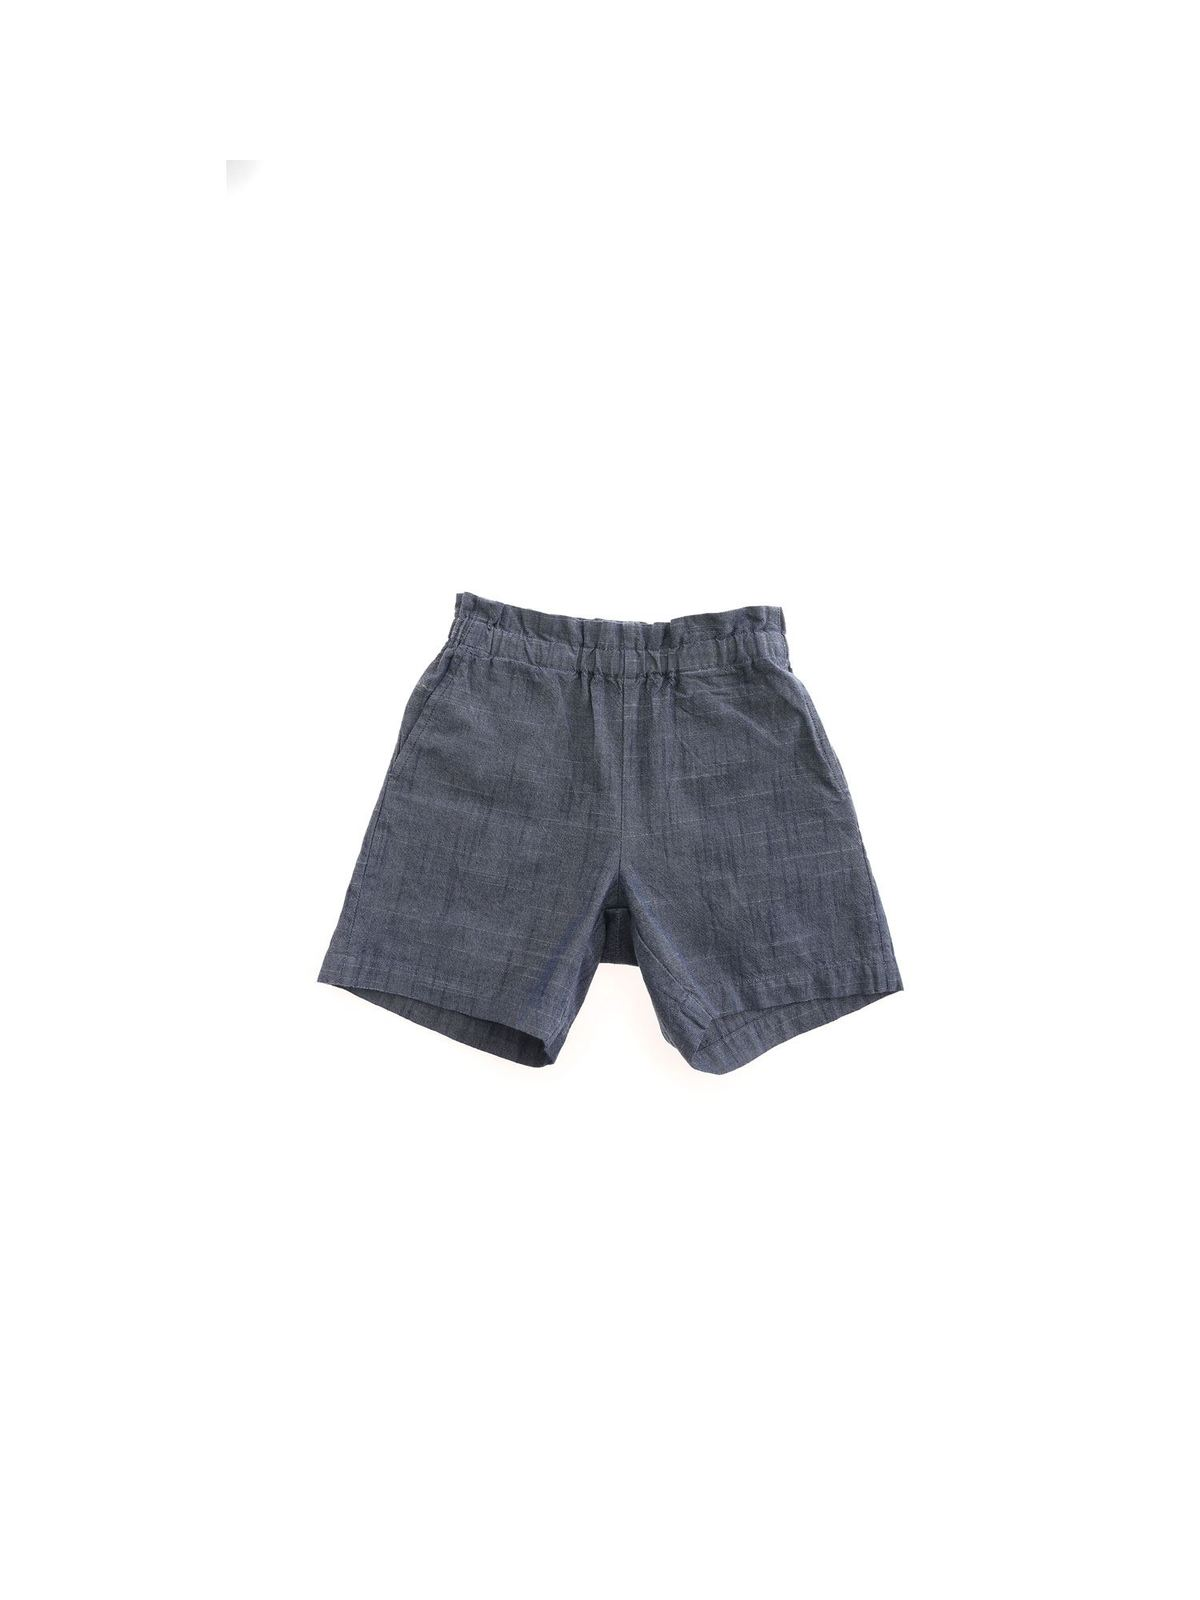 Bonpoint Clothing LESLIE SHORTS IN BLUE